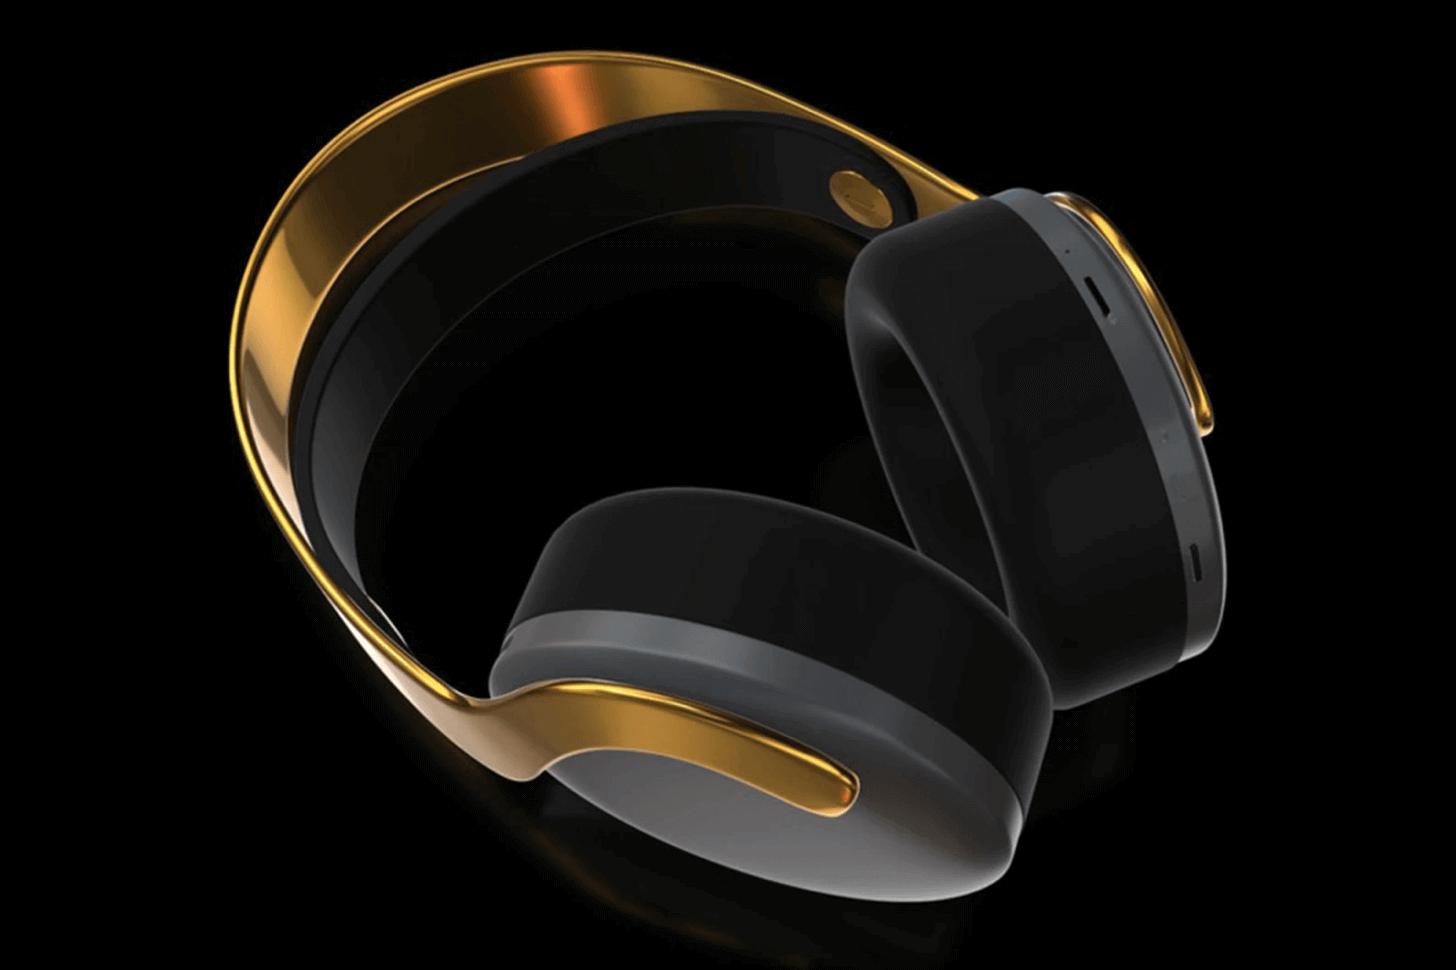 Goldgenie, PlayStation PS5'in 24 ayar altın foto